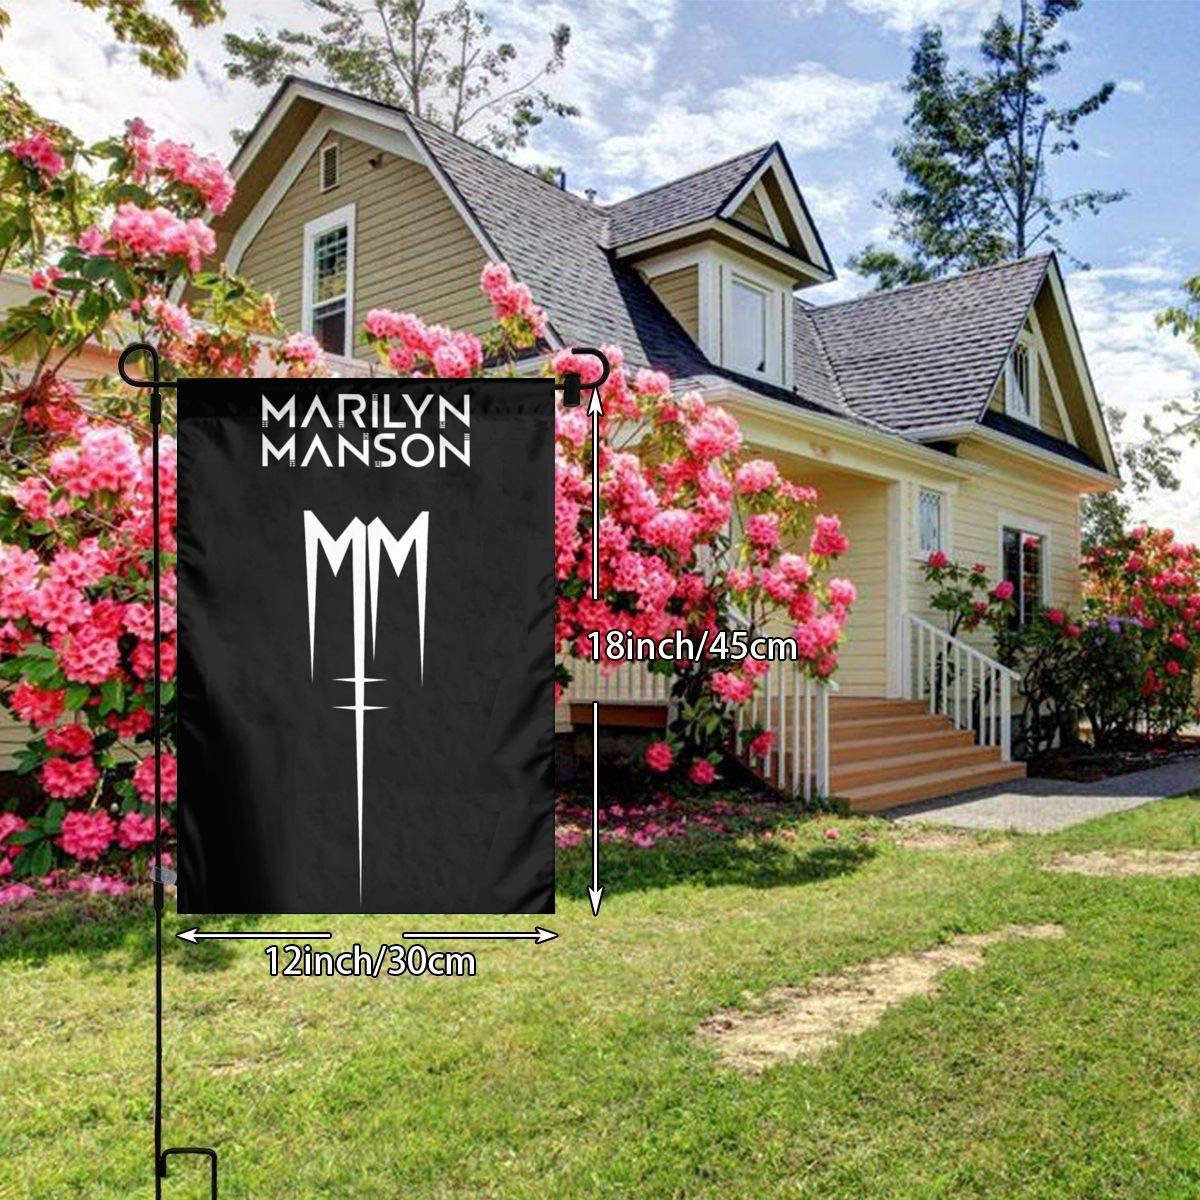 Amazon Com David E Everett Marilyn Manson Garden Flag 12x18